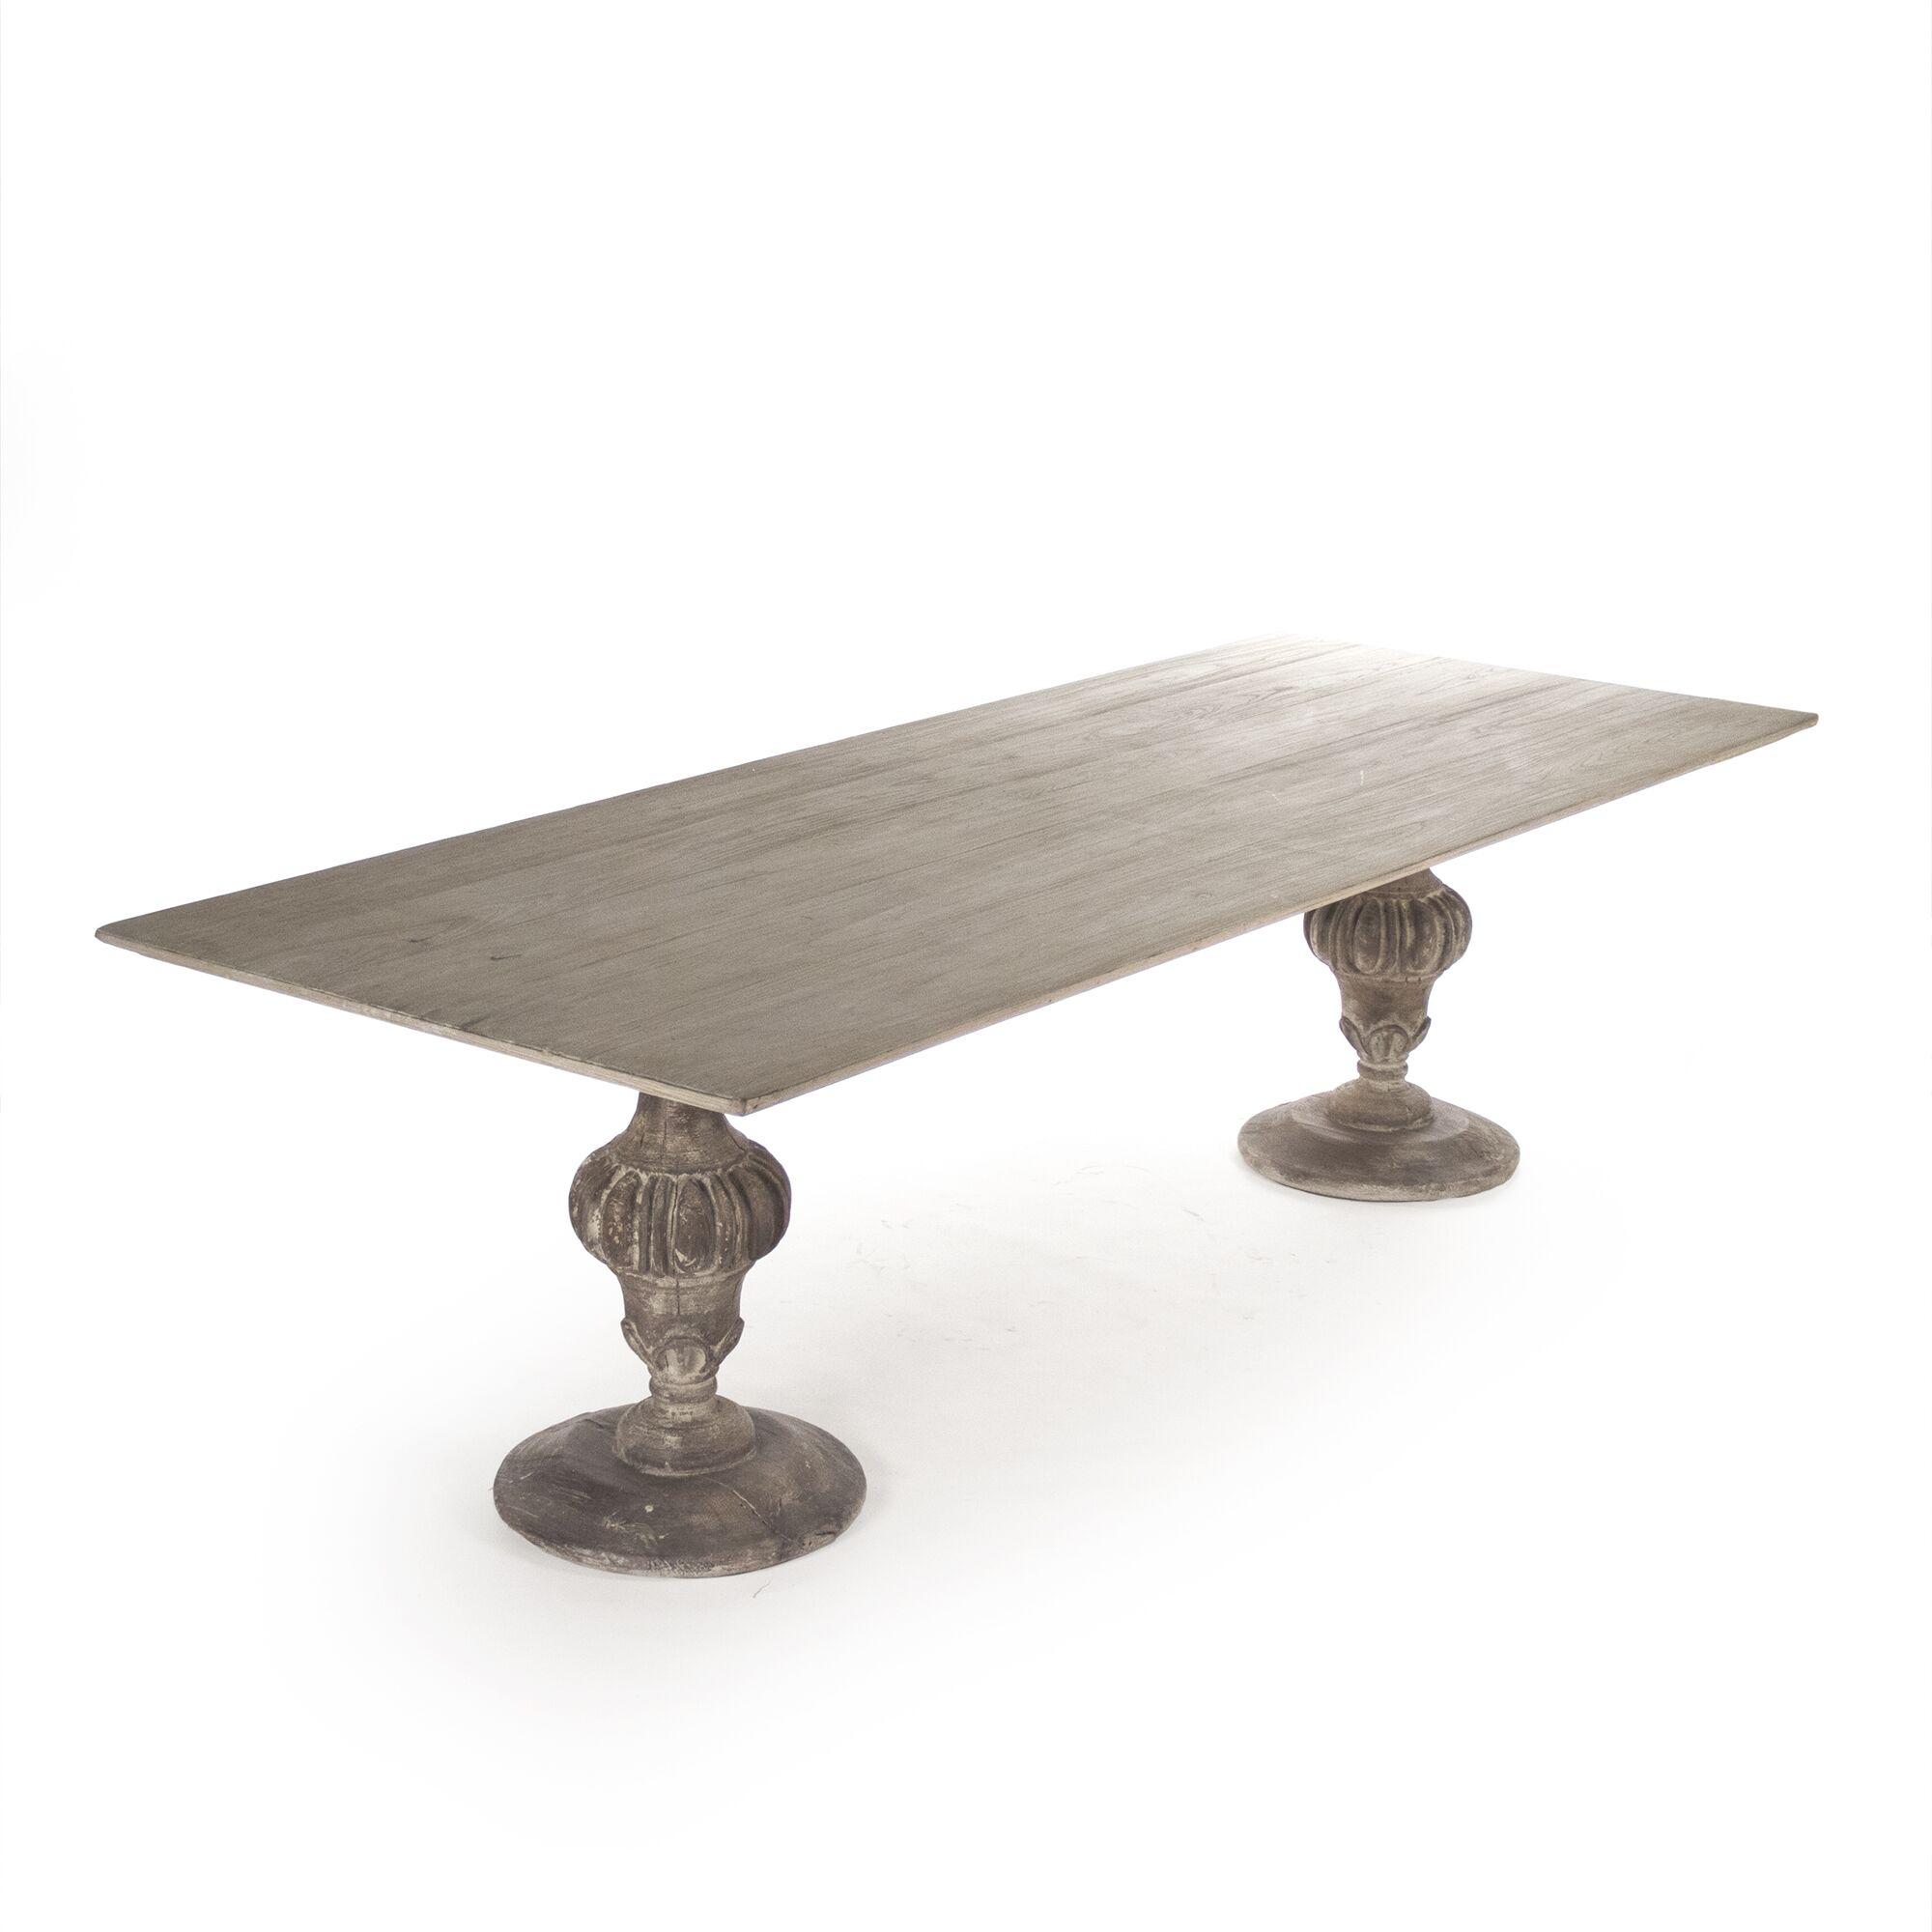 Kenneth Coffee Table